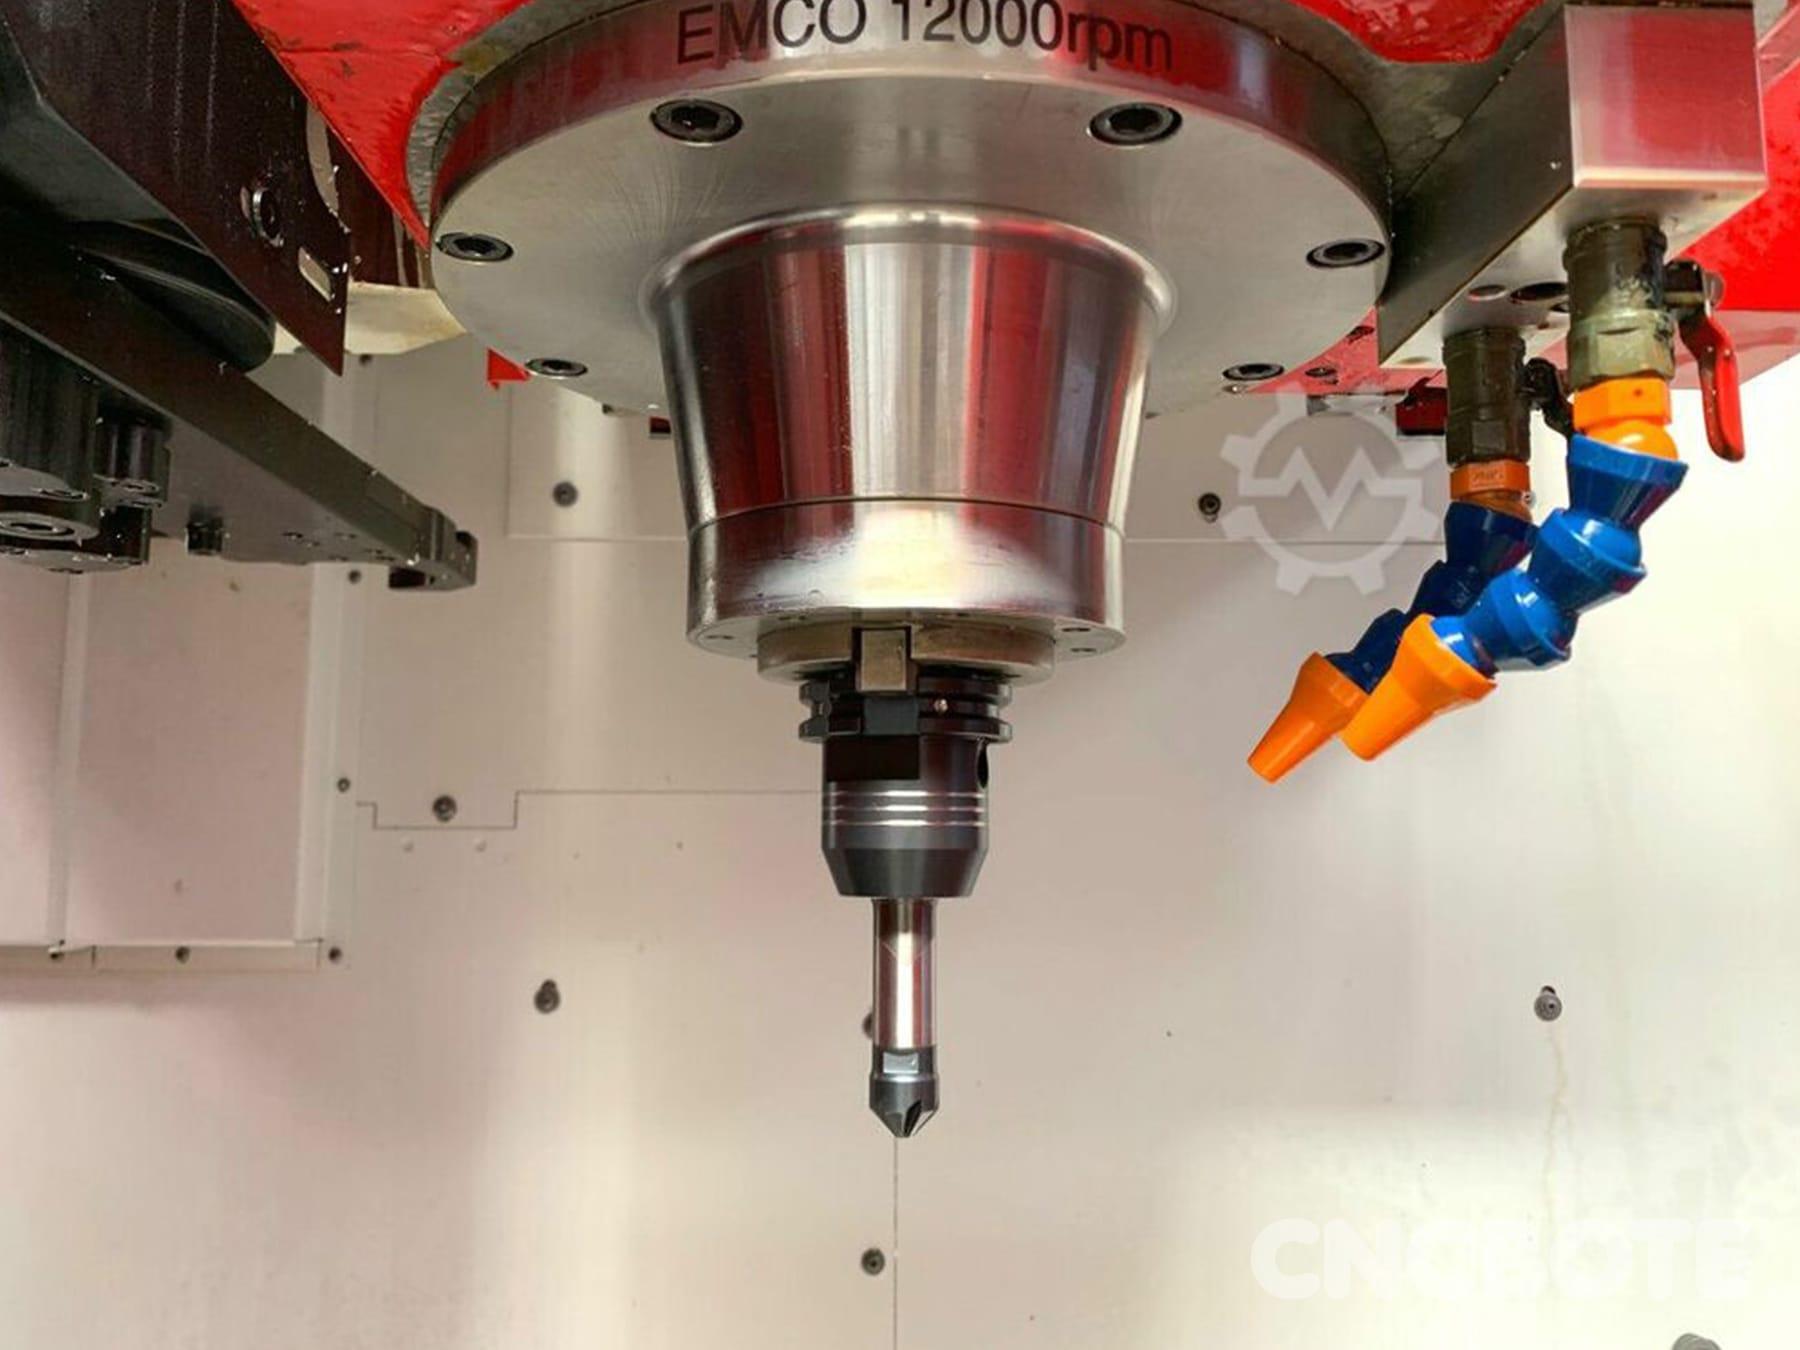 Emco Concept Mill 450 Bearbeitungszentrum